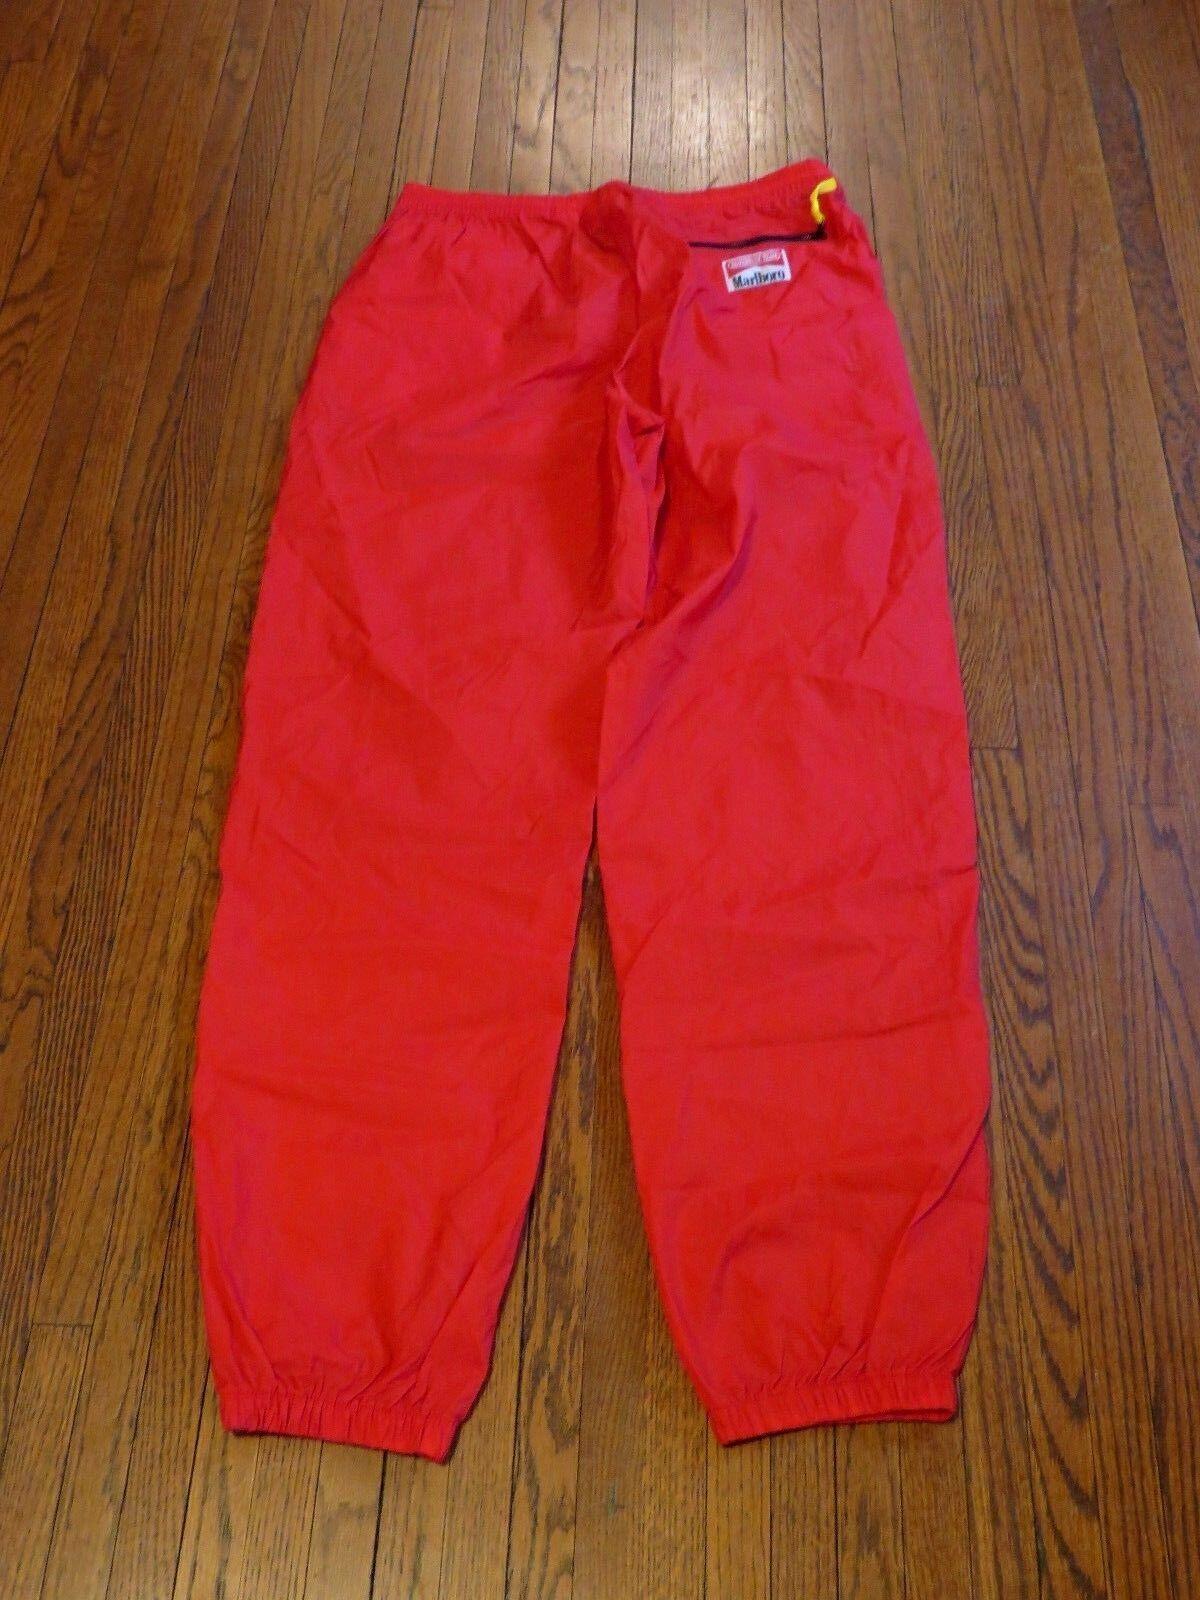 Men's VTG 80's 90's Marlbgold Red Windbreaker Pants sz L